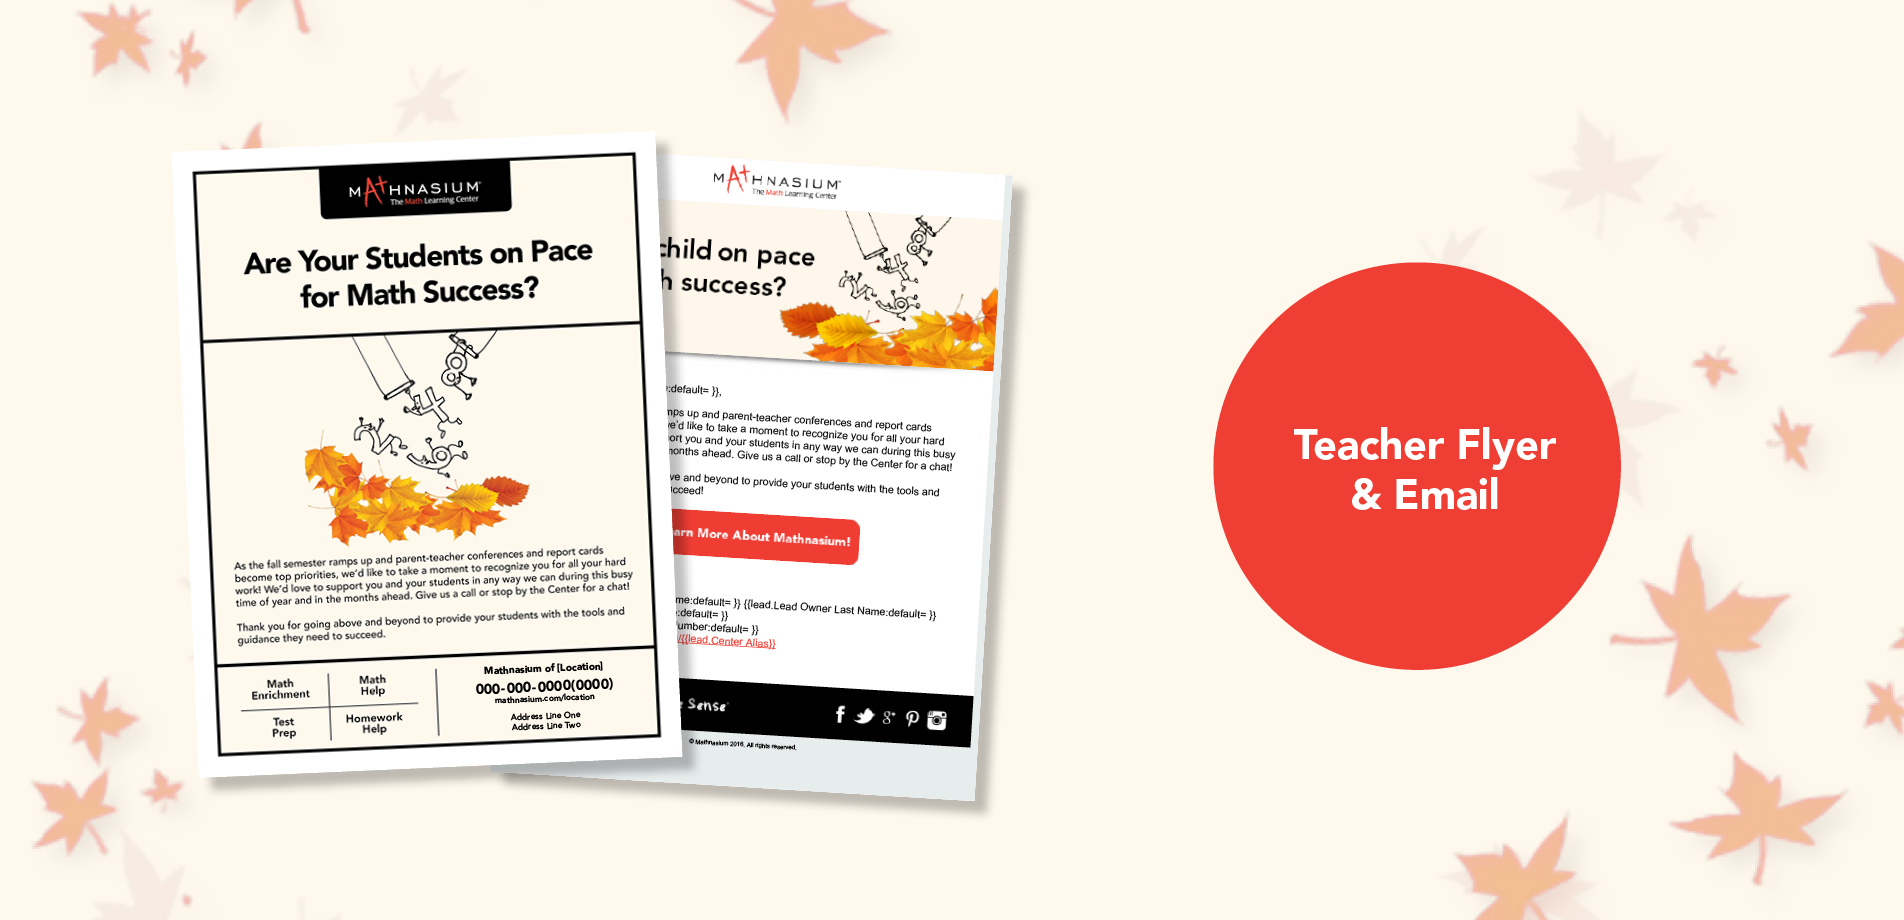 Teacher-Flyer-Email